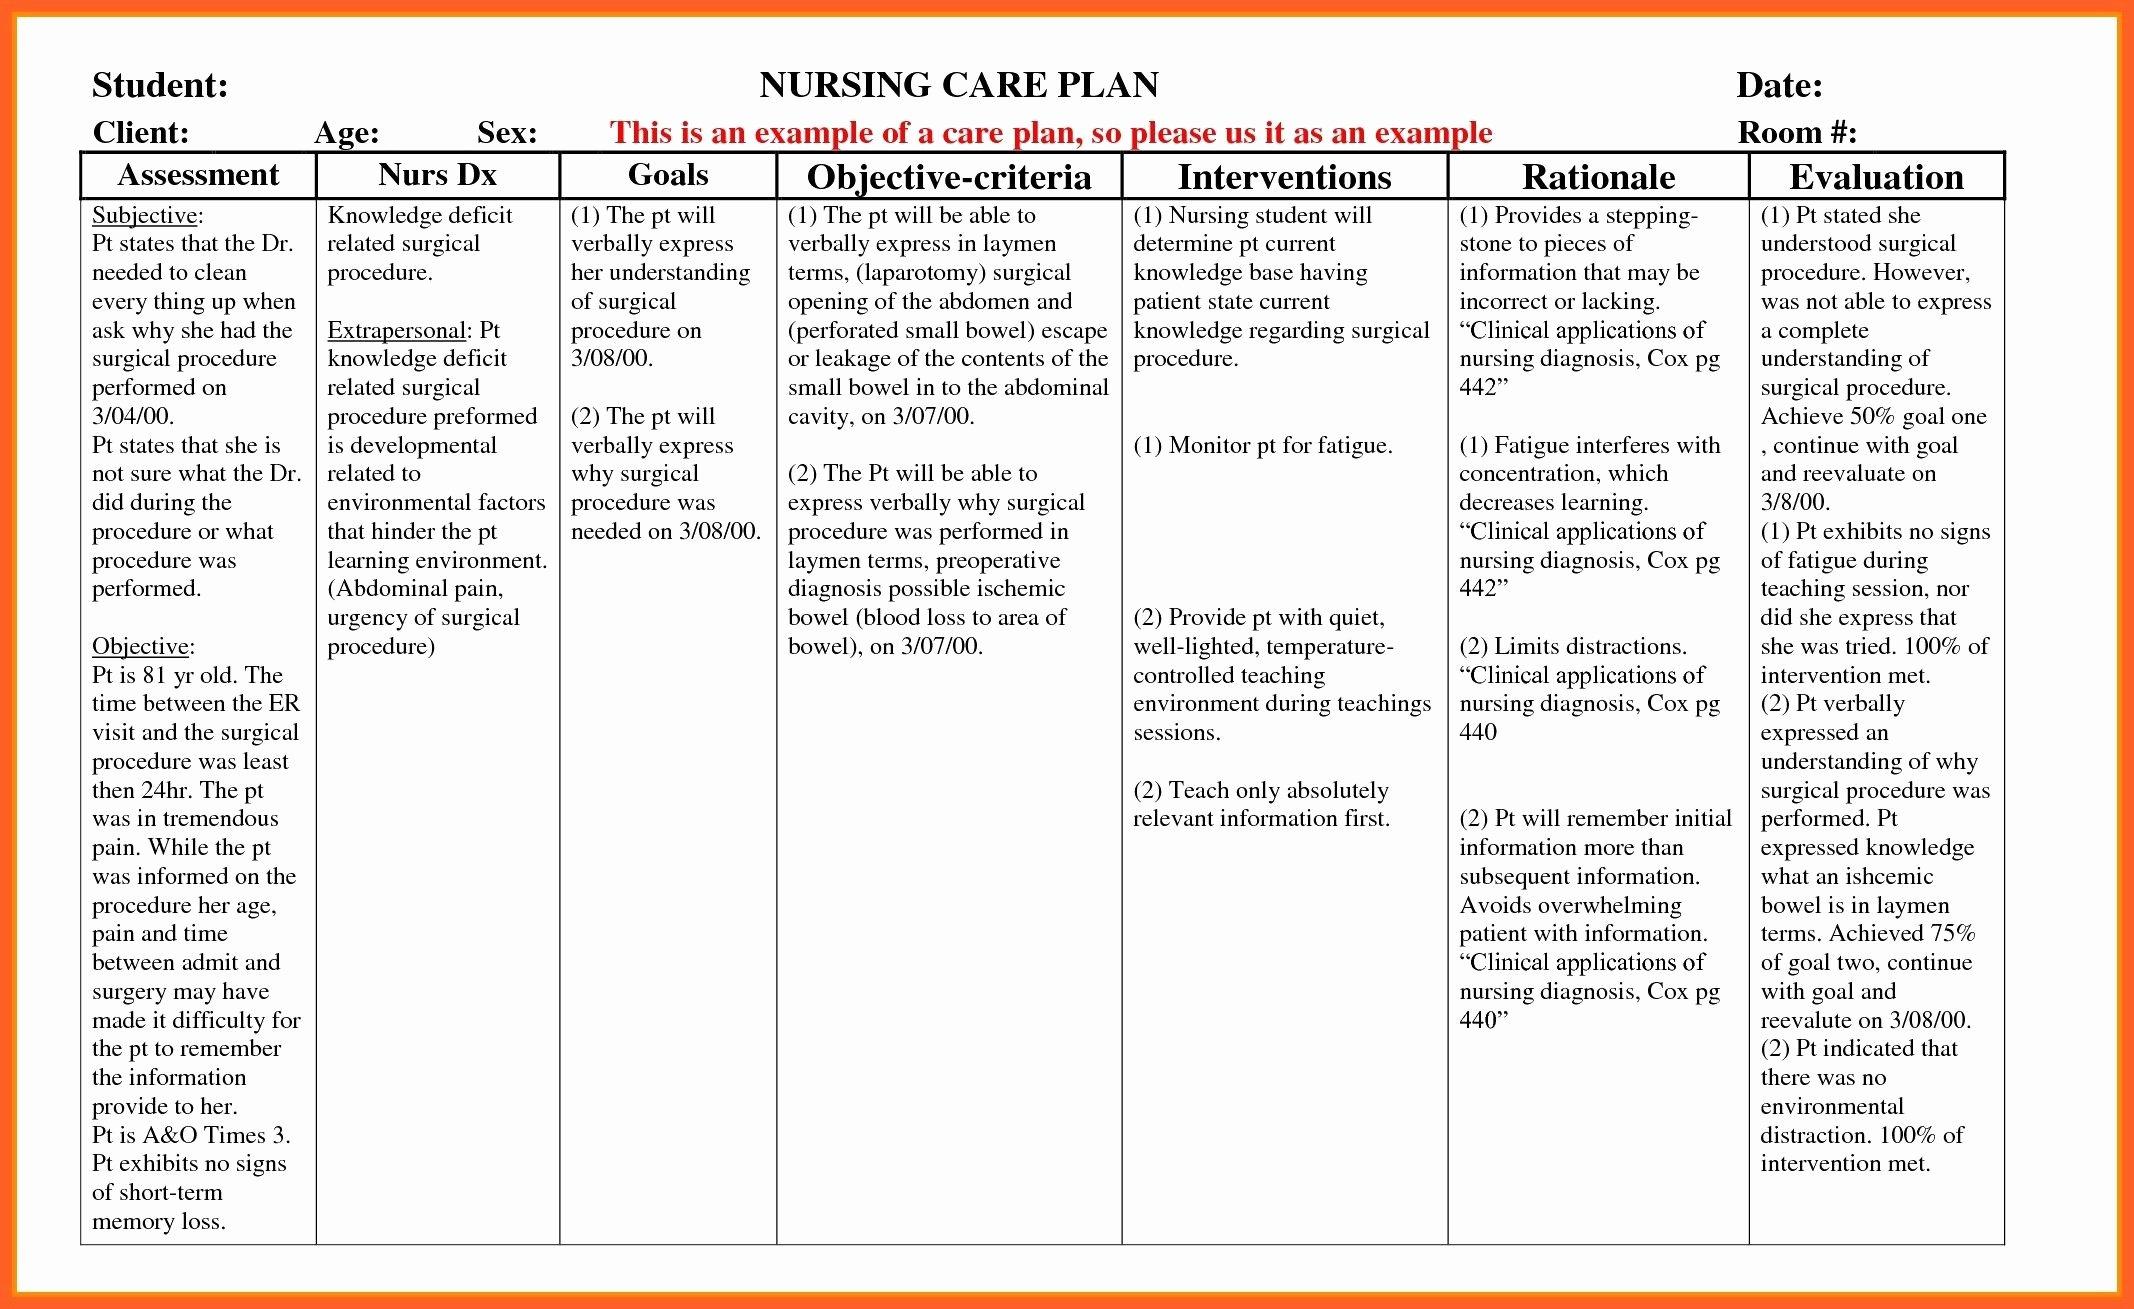 Nursing Care Plan Template Lovely Example Care Plan Template for Elderly Nursing Home